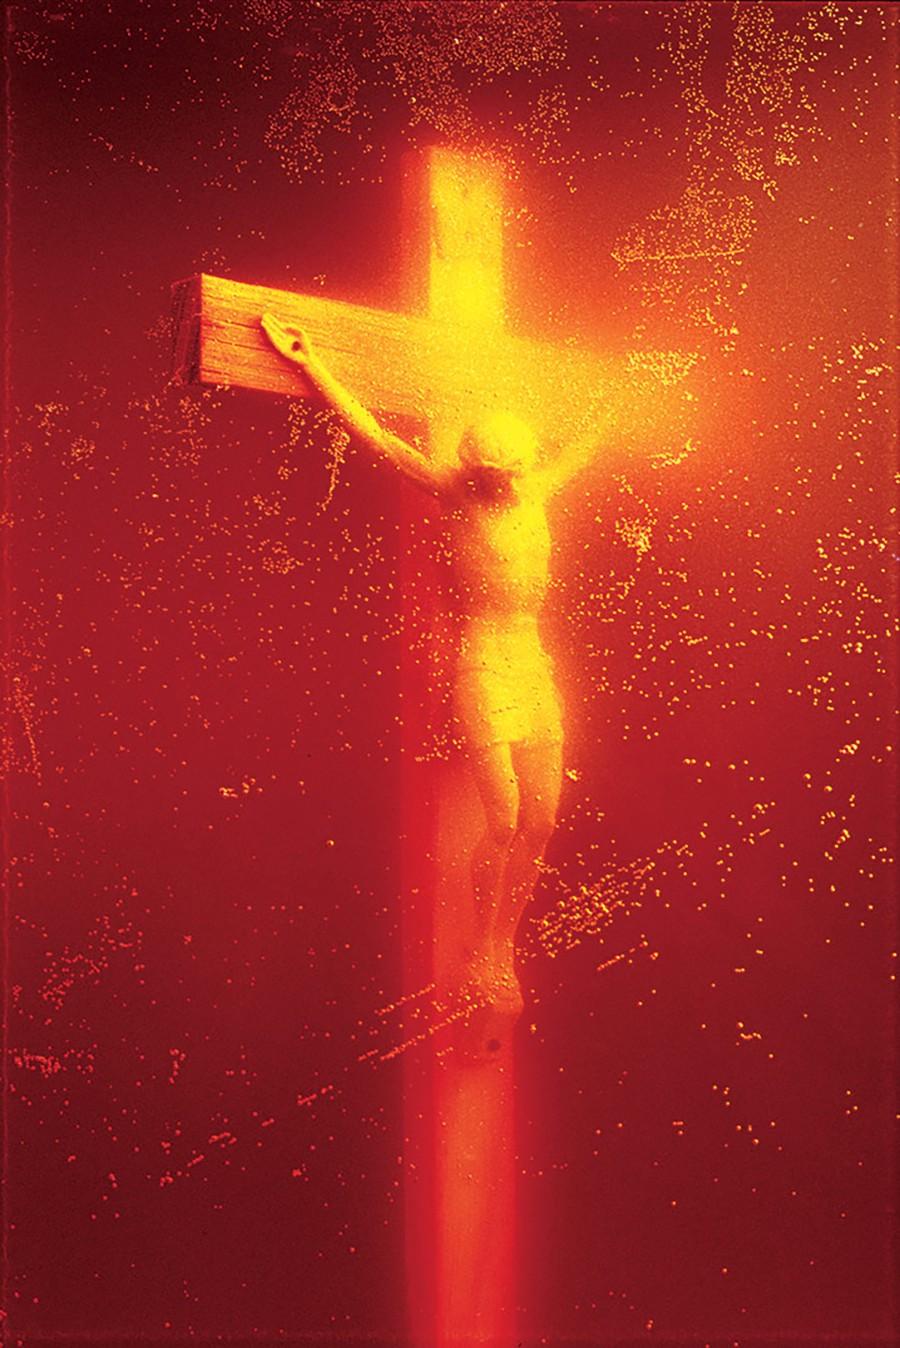 Conservatives Still Pissed About 'Piss Christ' | MEL Magazine